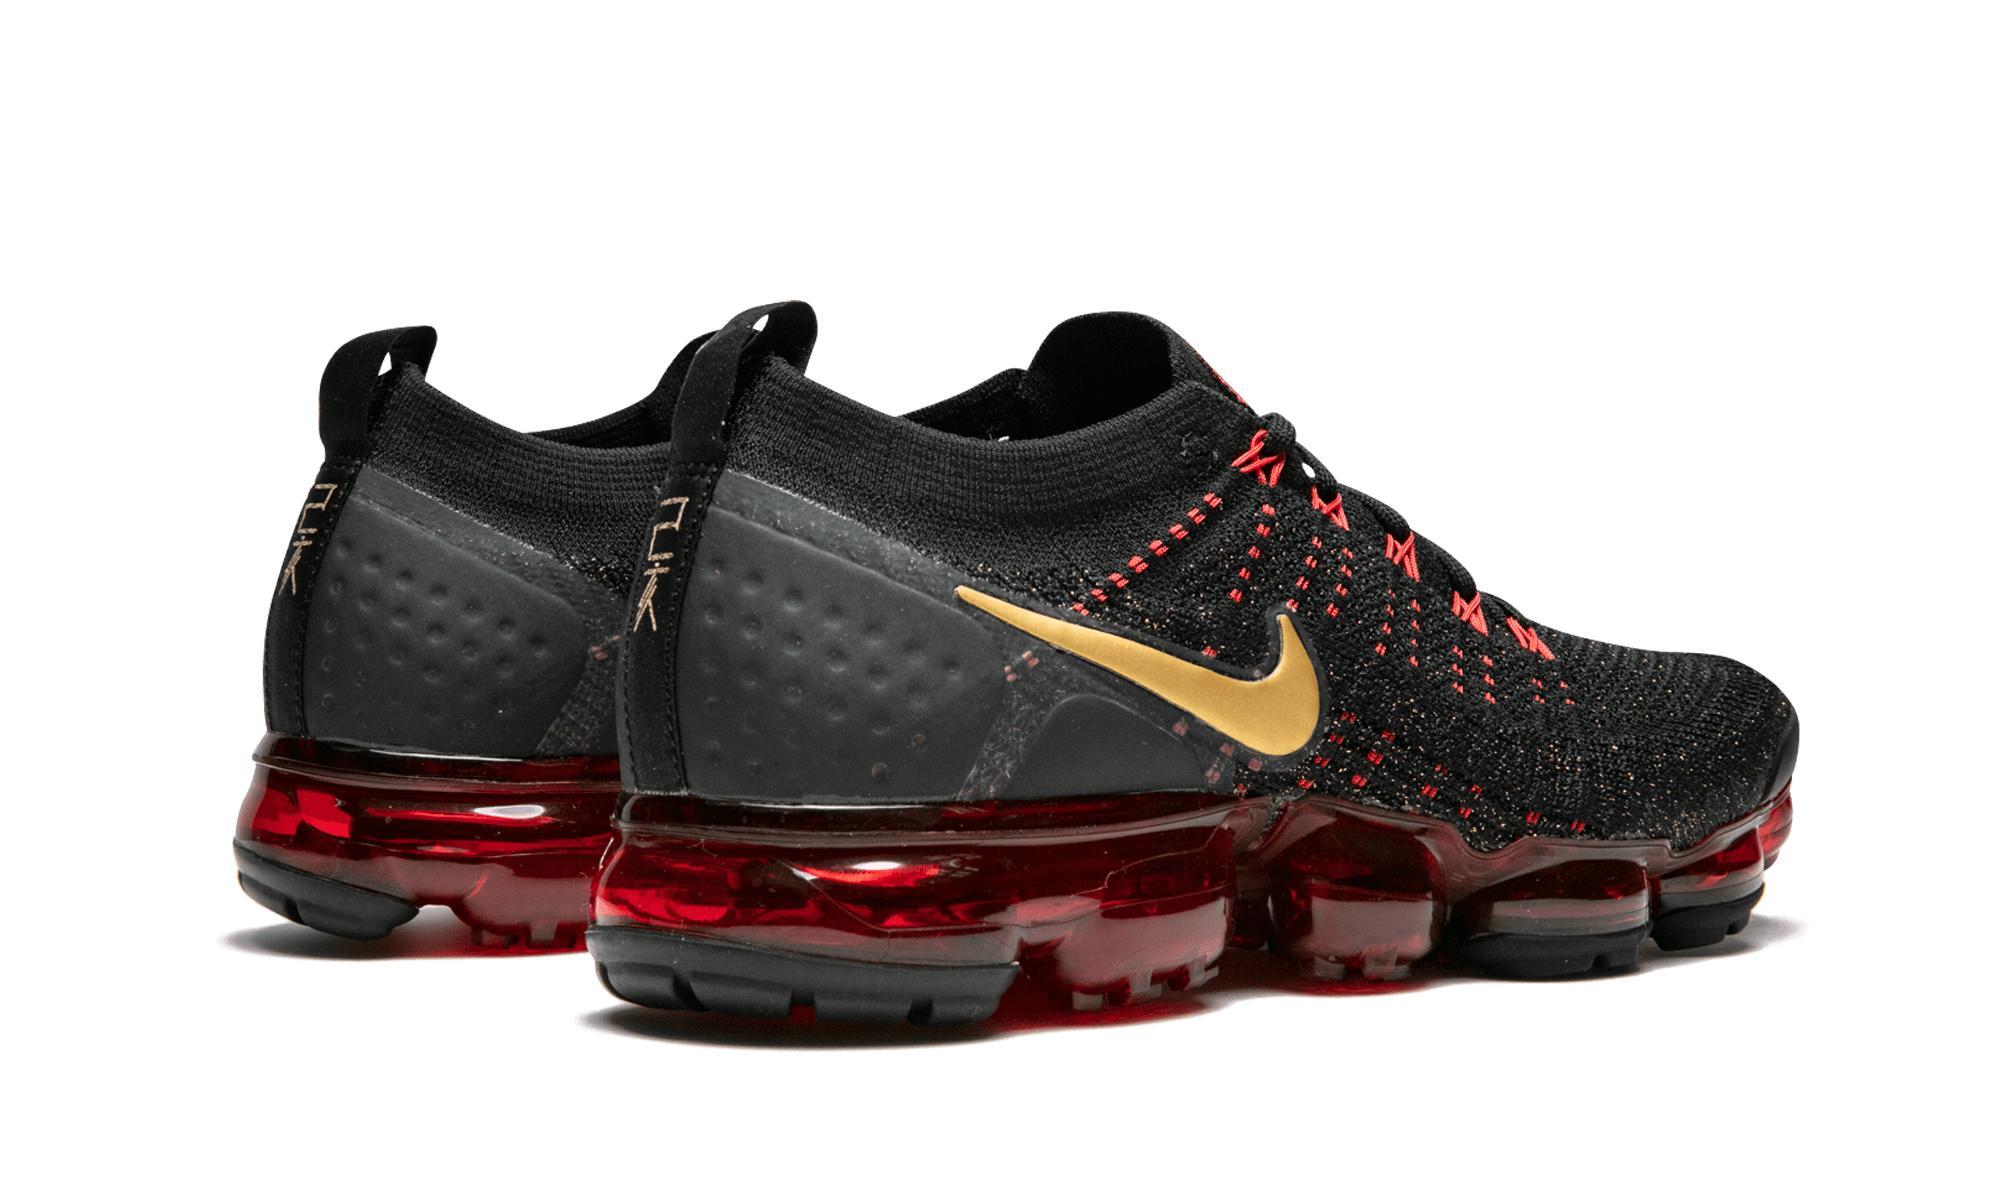 32d965642ebc7 Nike Air Vapormax Fk 2 Cny for Men - Lyst